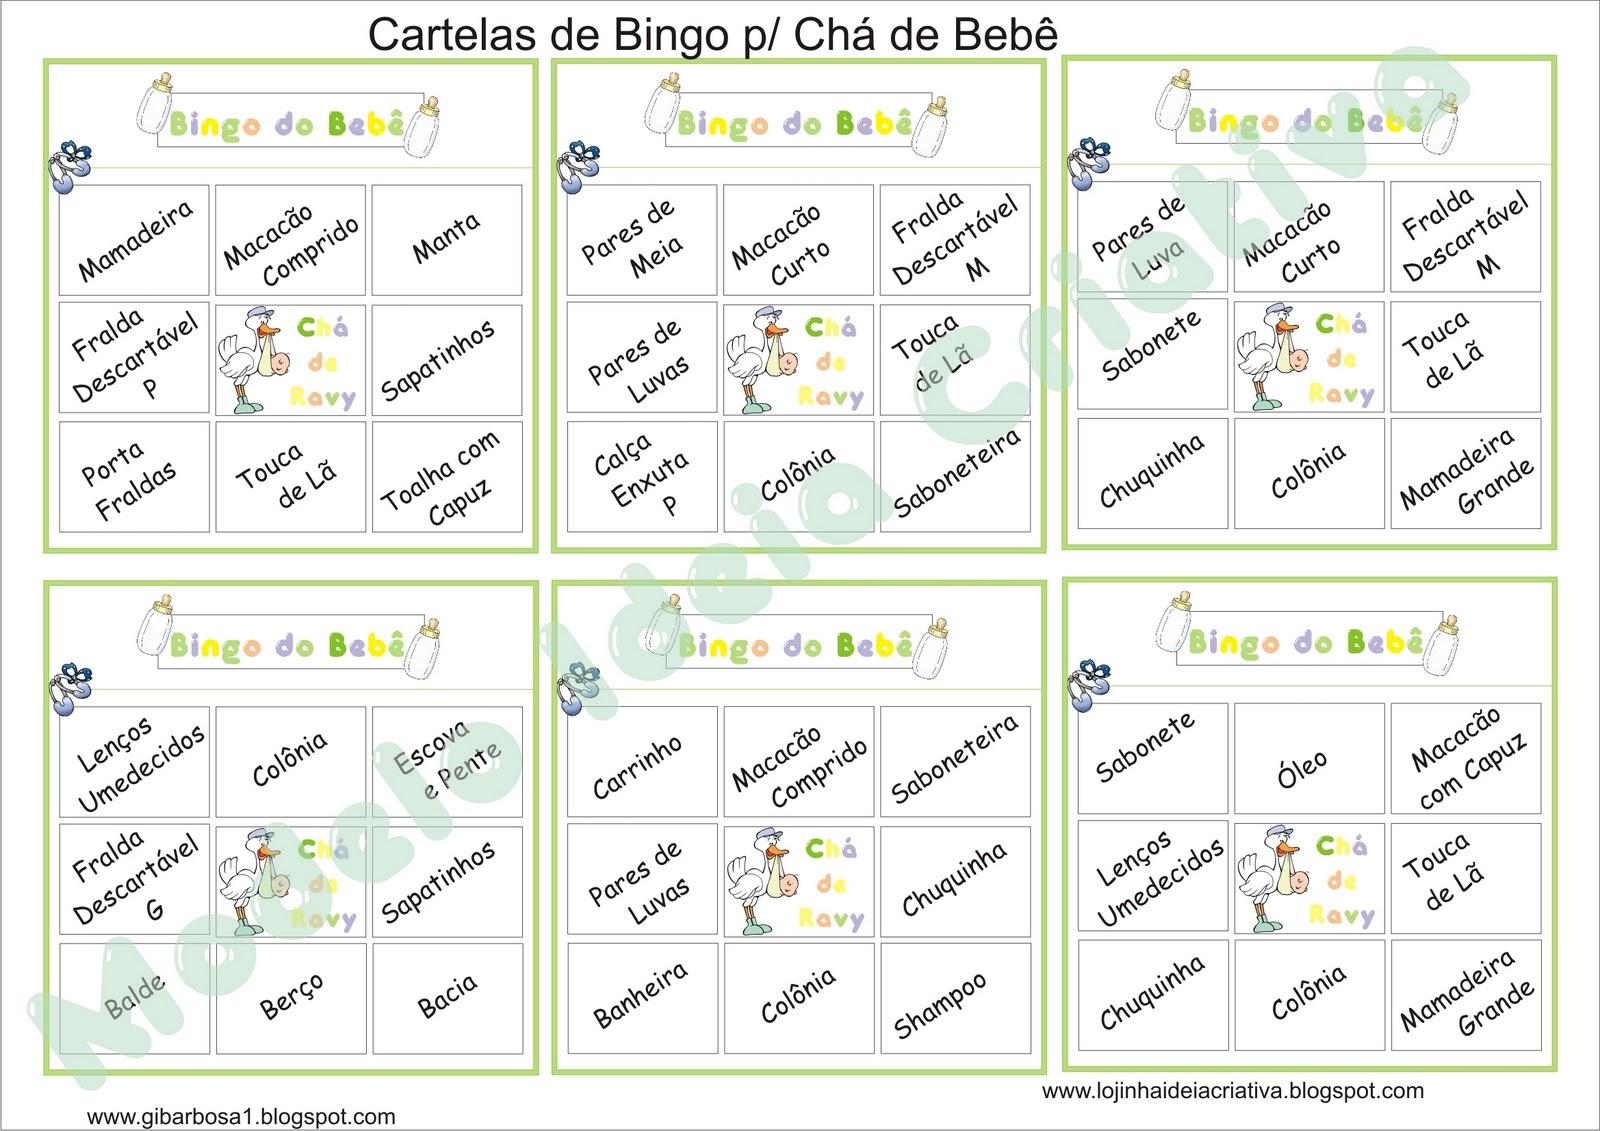 bingo+ch%C3%A1+de+beb%C3%AA%2C+ch%C3%A1+de+beb%C3%AA%2C+baby+shower